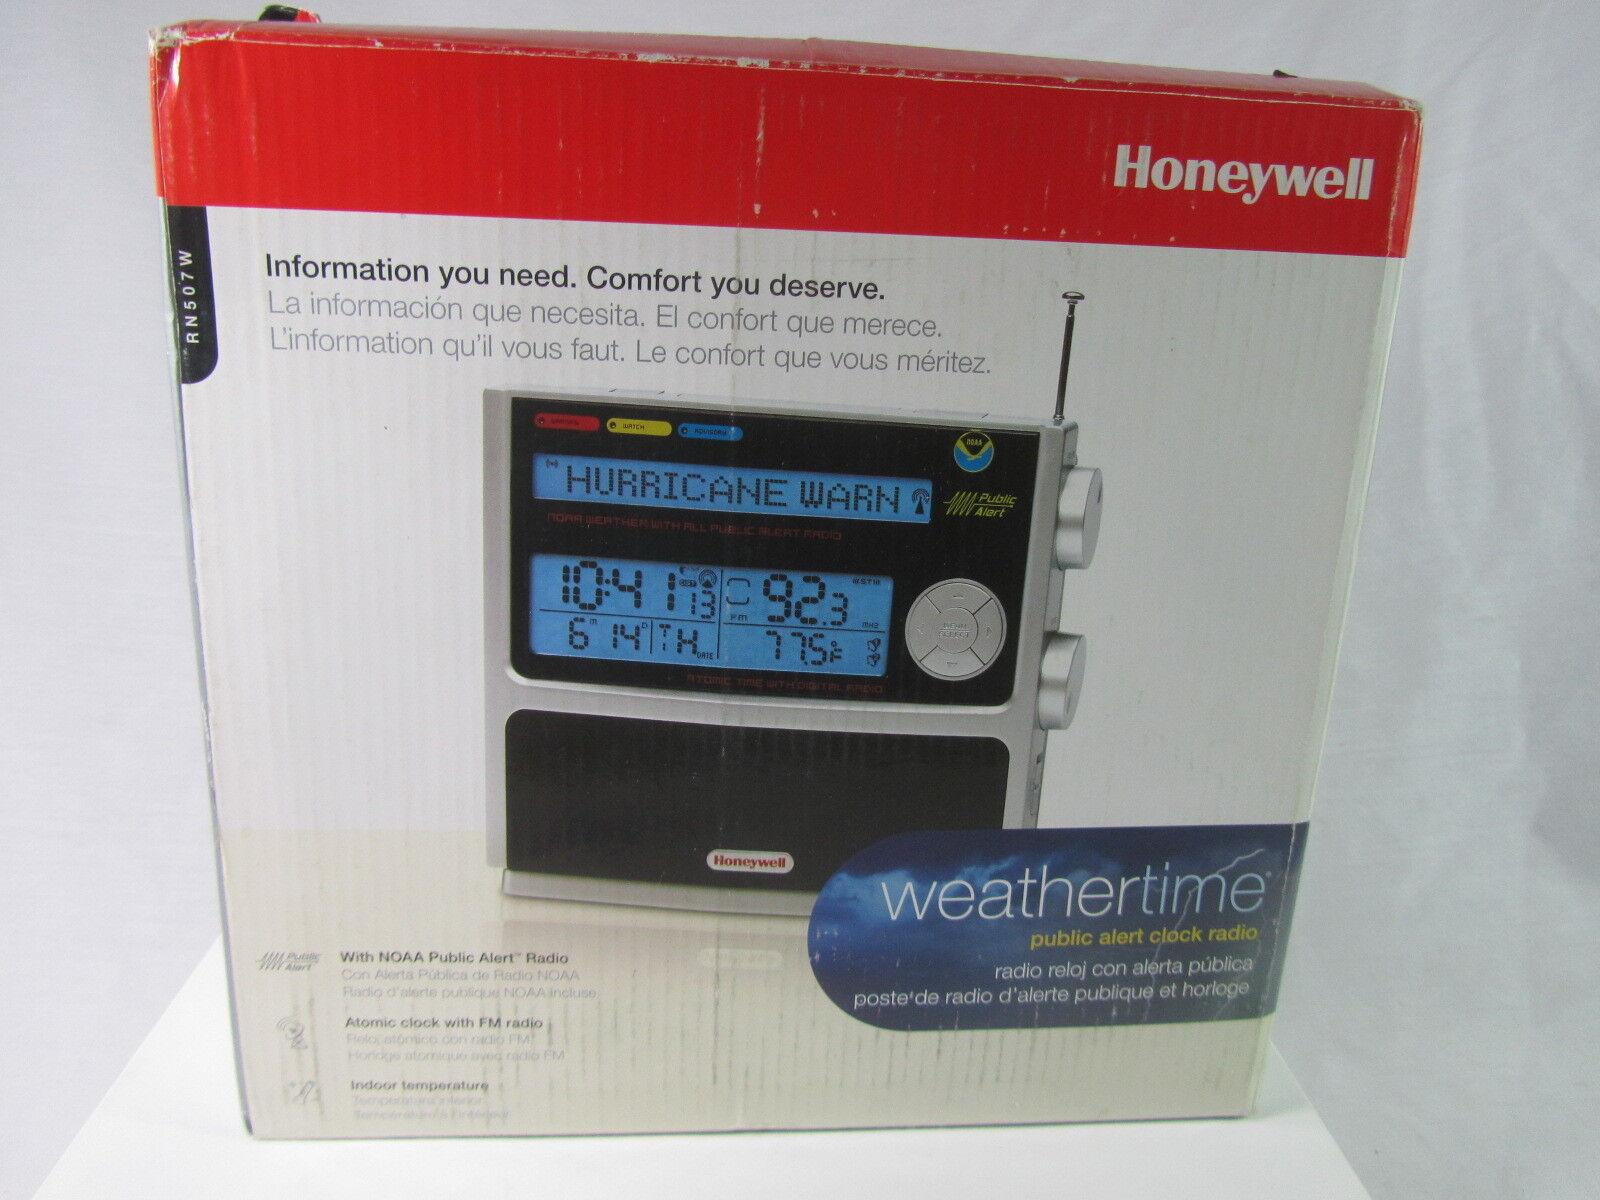 NEW Genuine  Honeywell RN507W NOAA FM Radio with Atomic Clock  Black